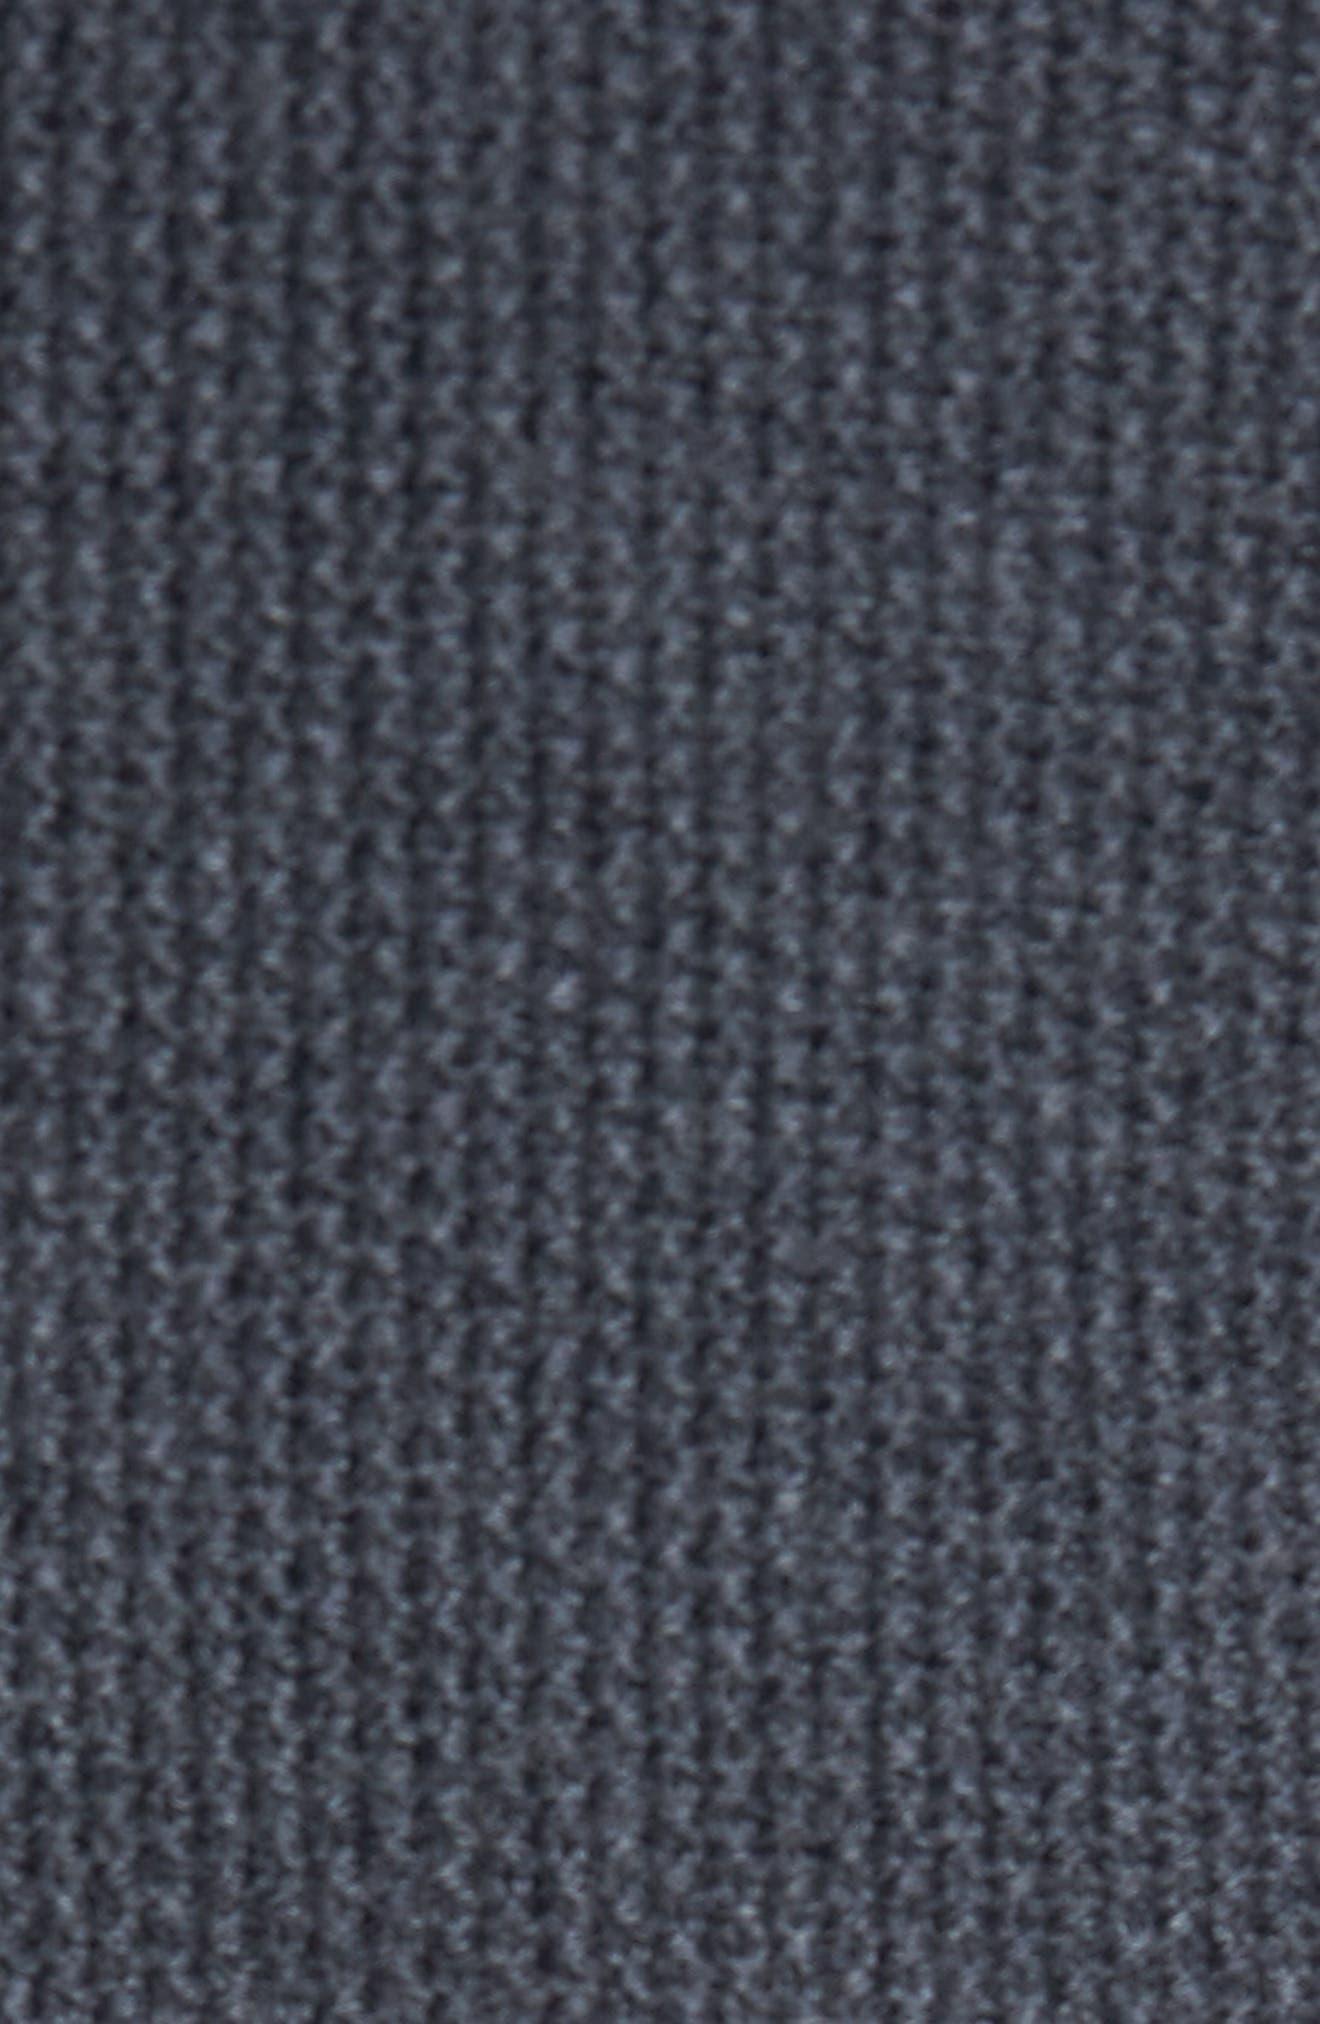 Hinman Quilt Front Merino Cardigan,                             Alternate thumbnail 5, color,                             010